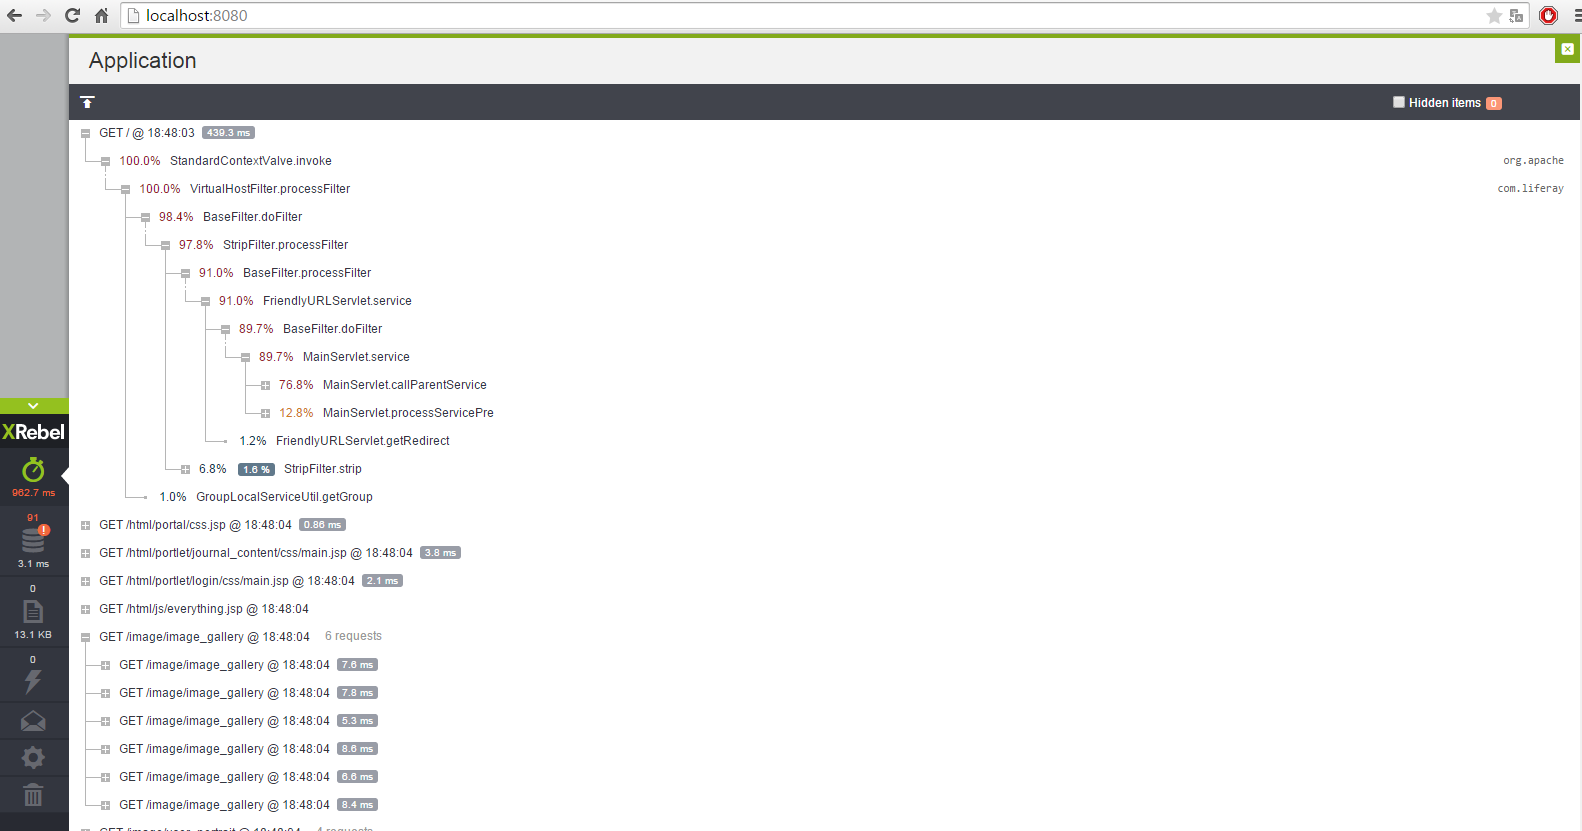 java console 6.0.29